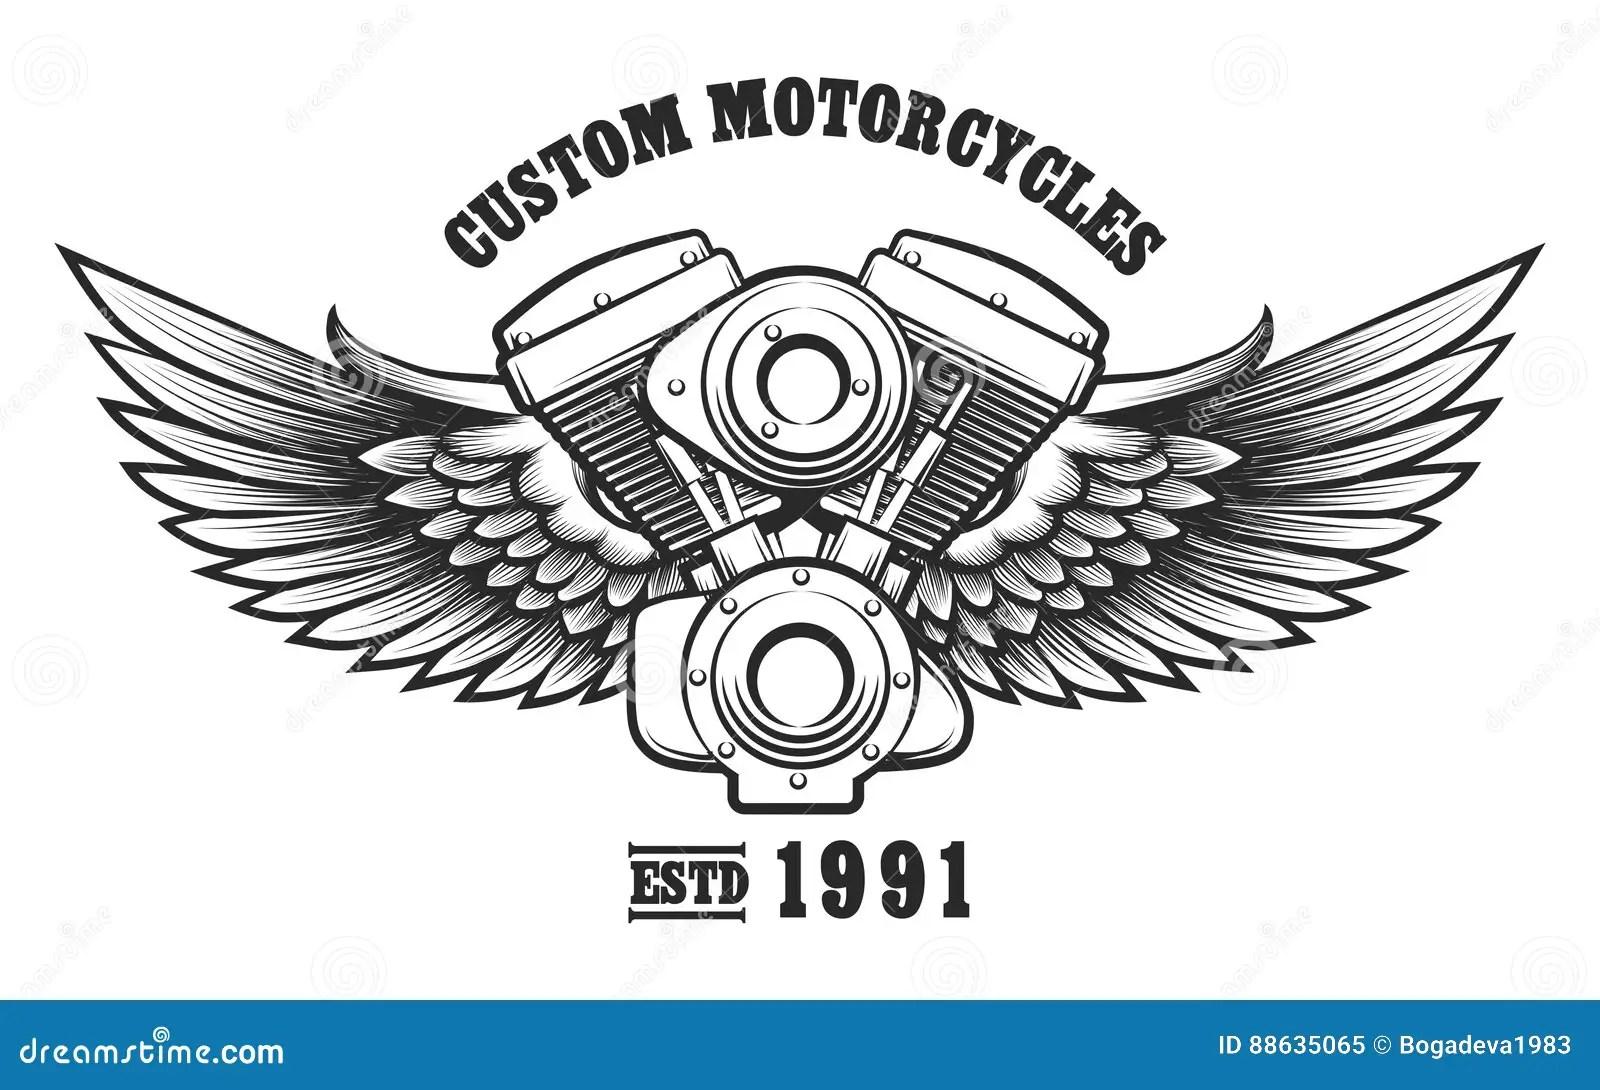 Custom Motorcycle Workshop Emblem Stock Vector